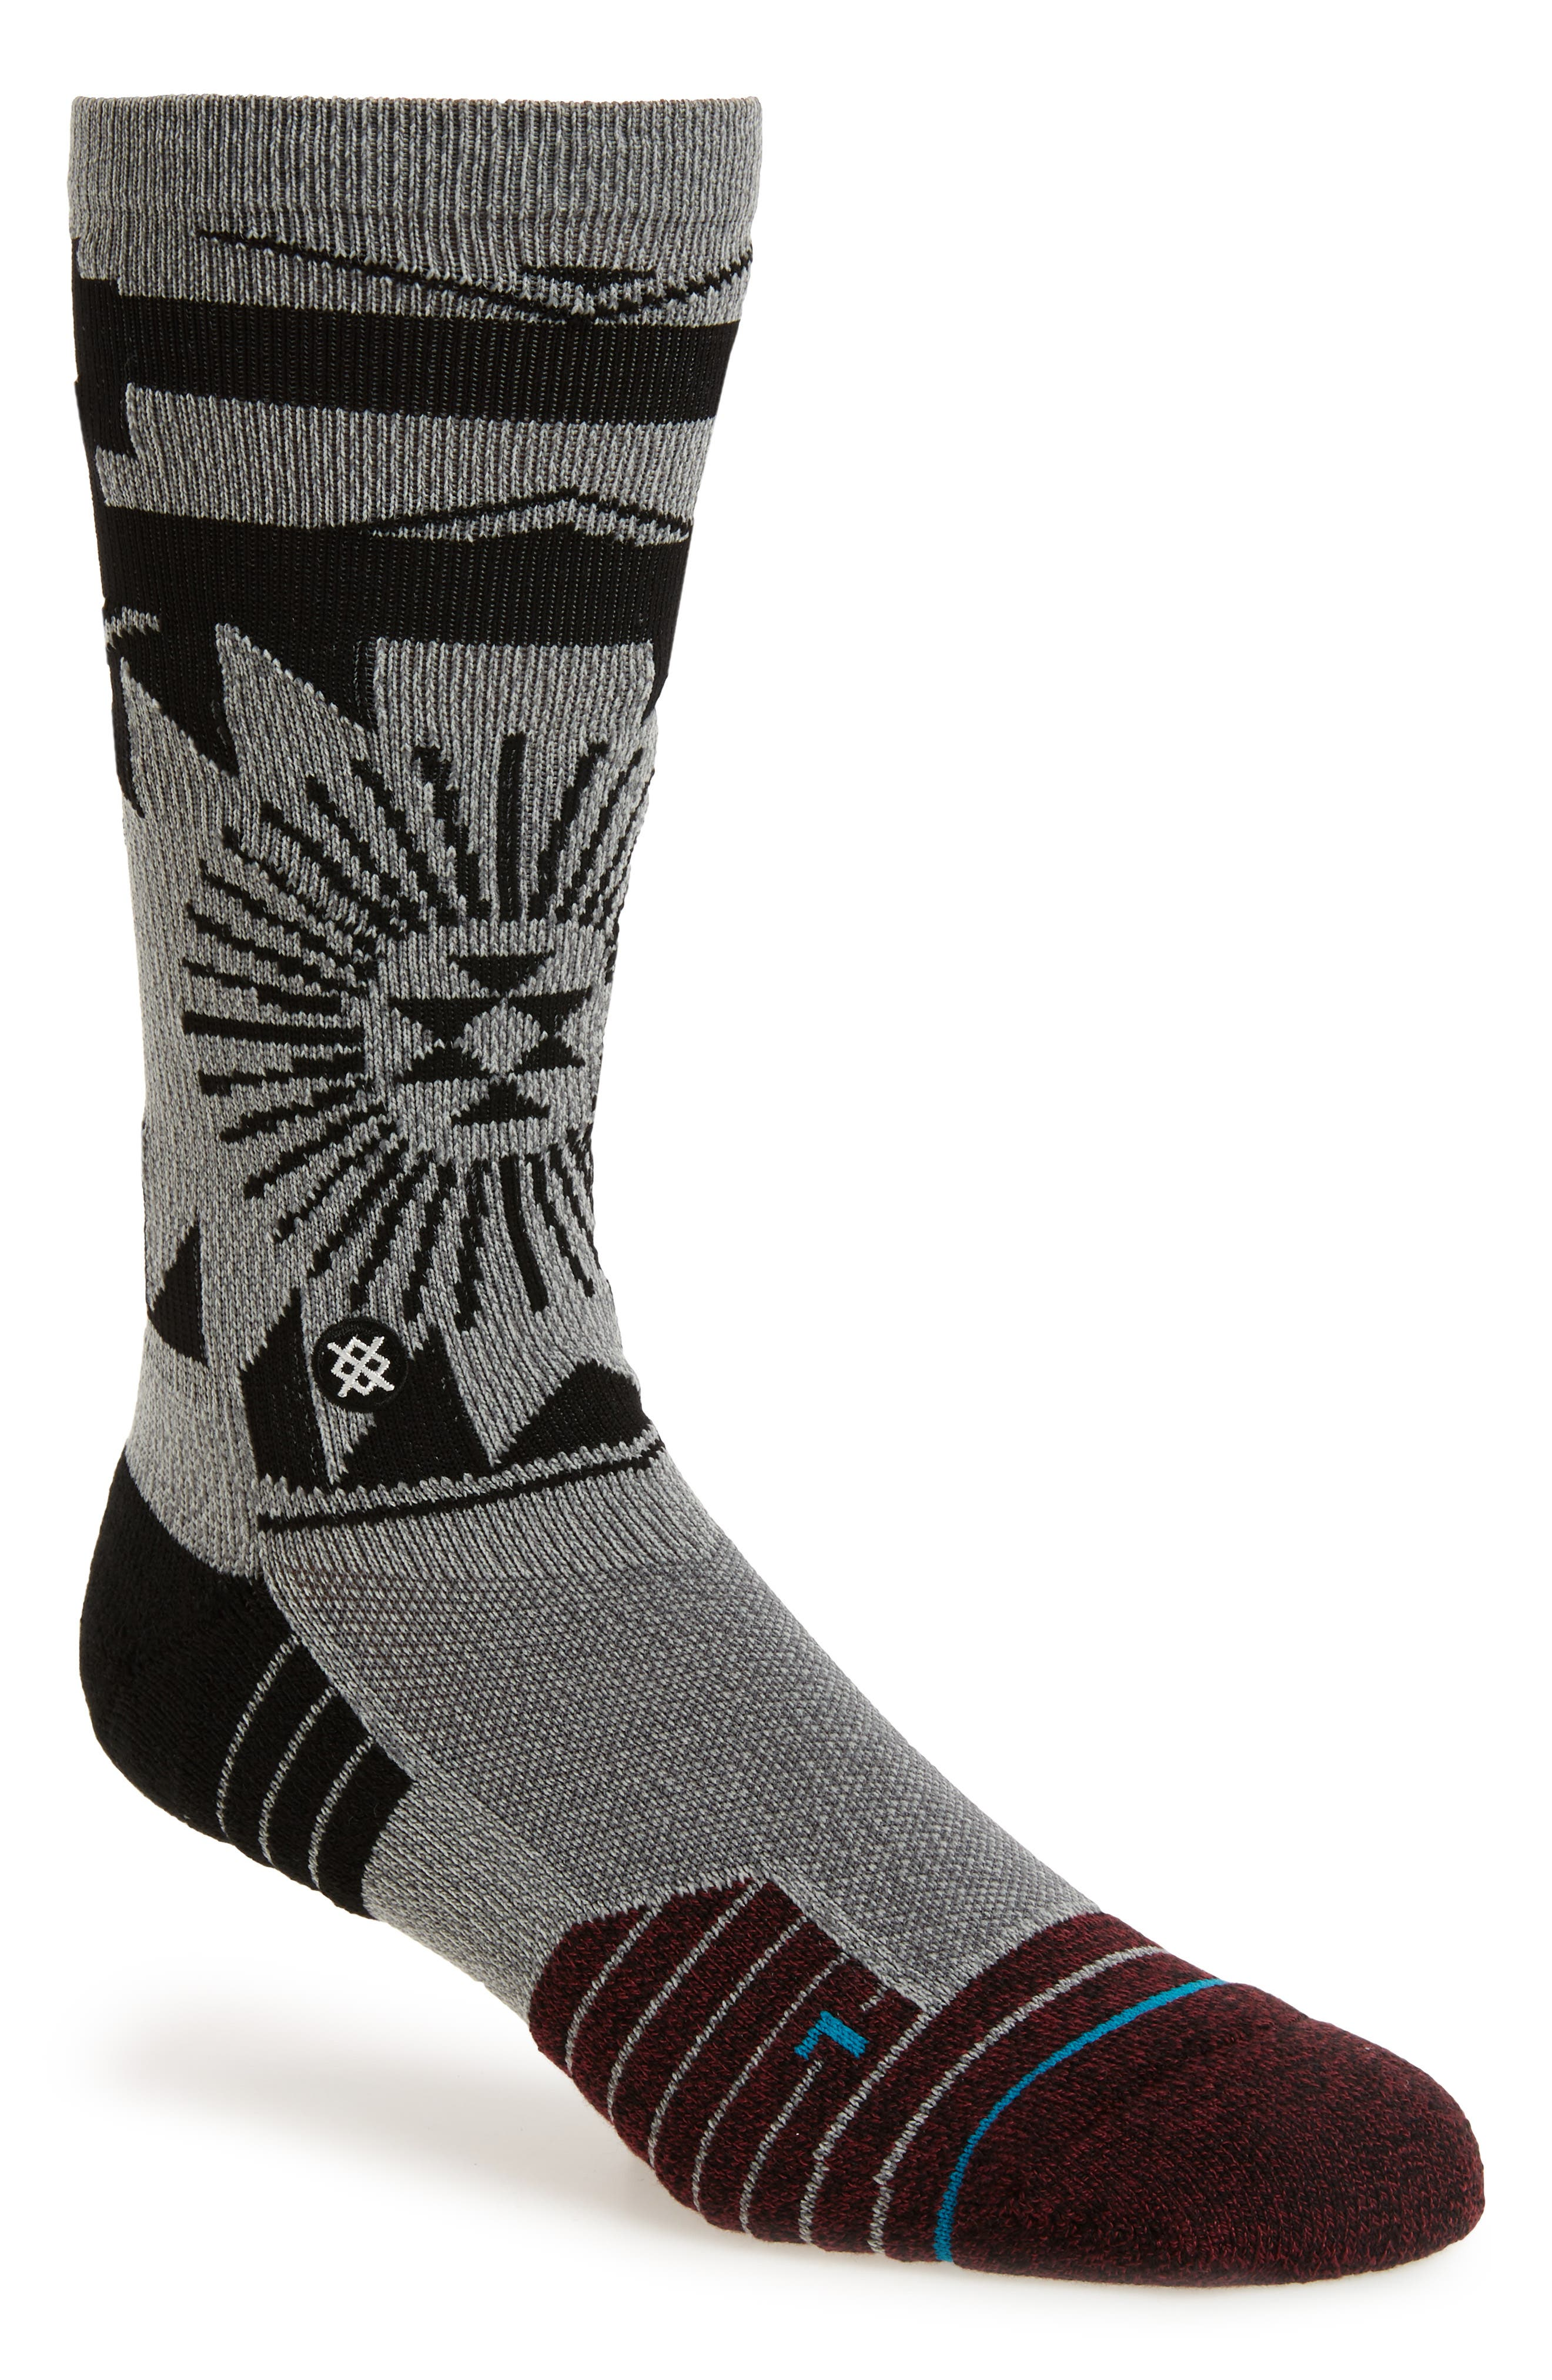 Stance El Morro Athletic Fusion Crew Socks